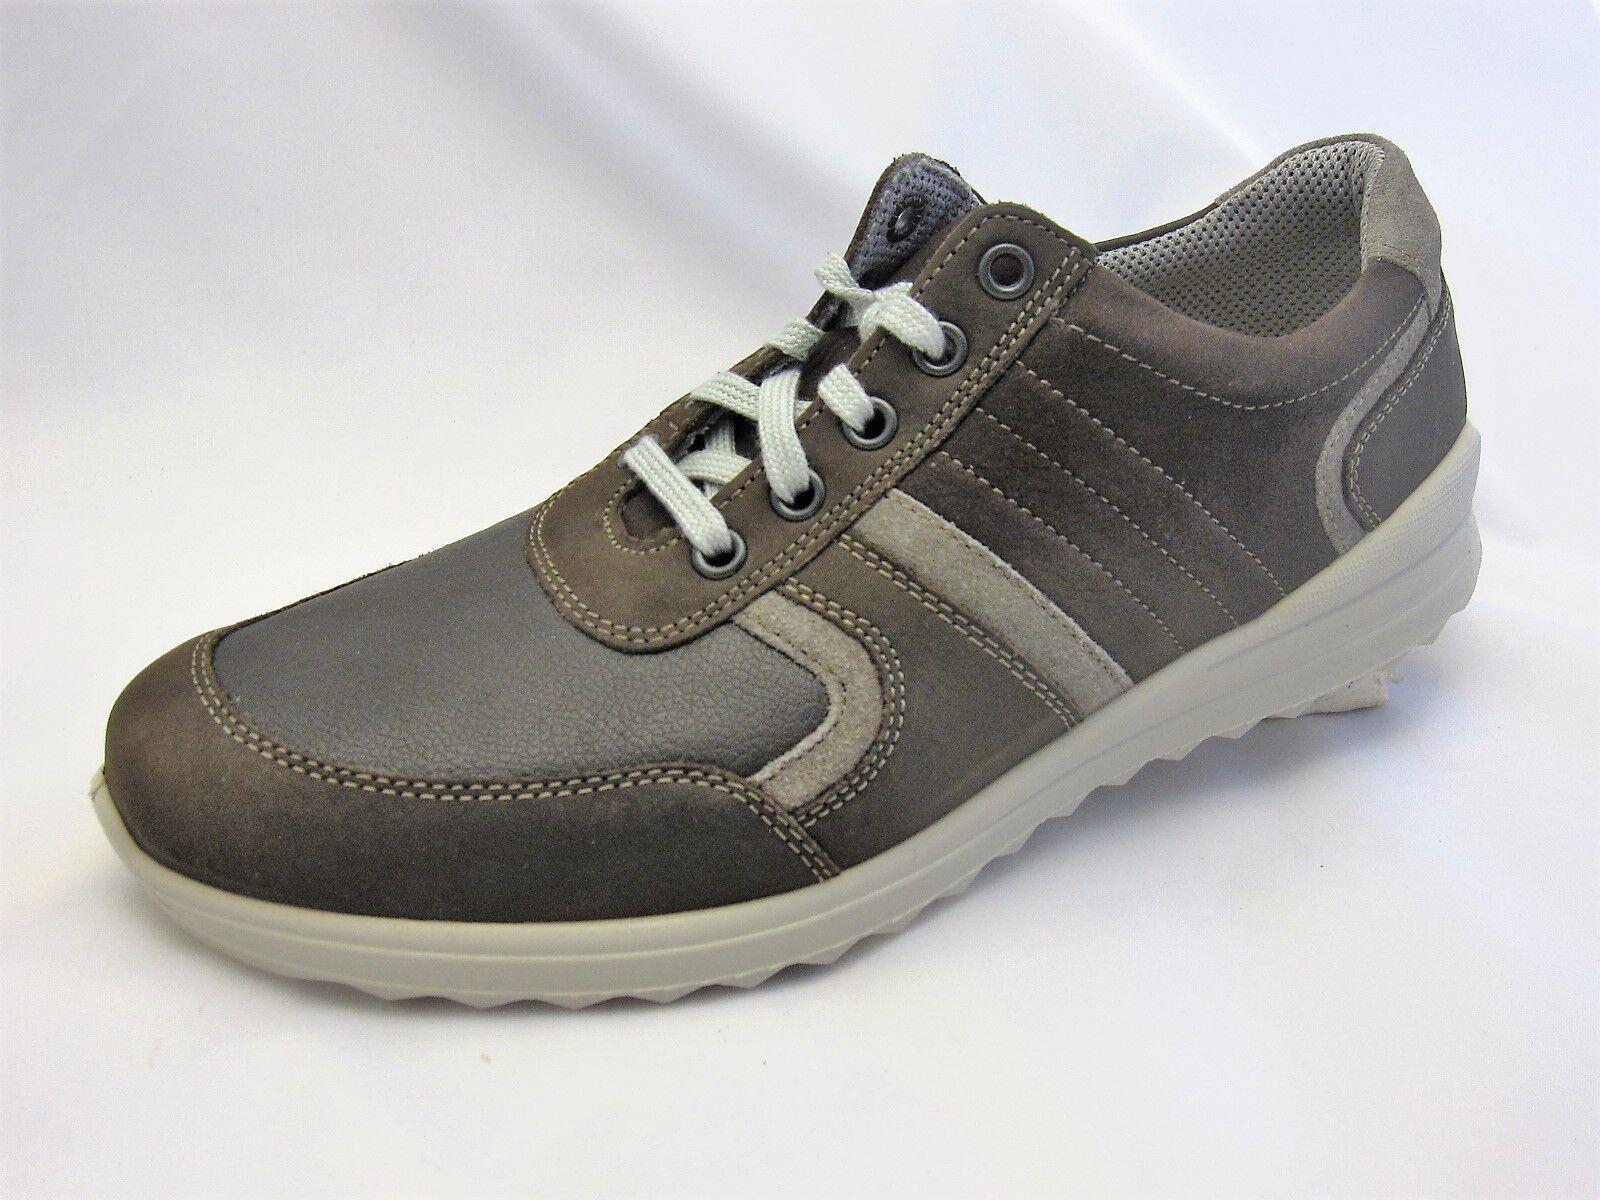 Jomos Herrenschuhe, braun  Leder, Weite H, herausnehmbares Fußbett